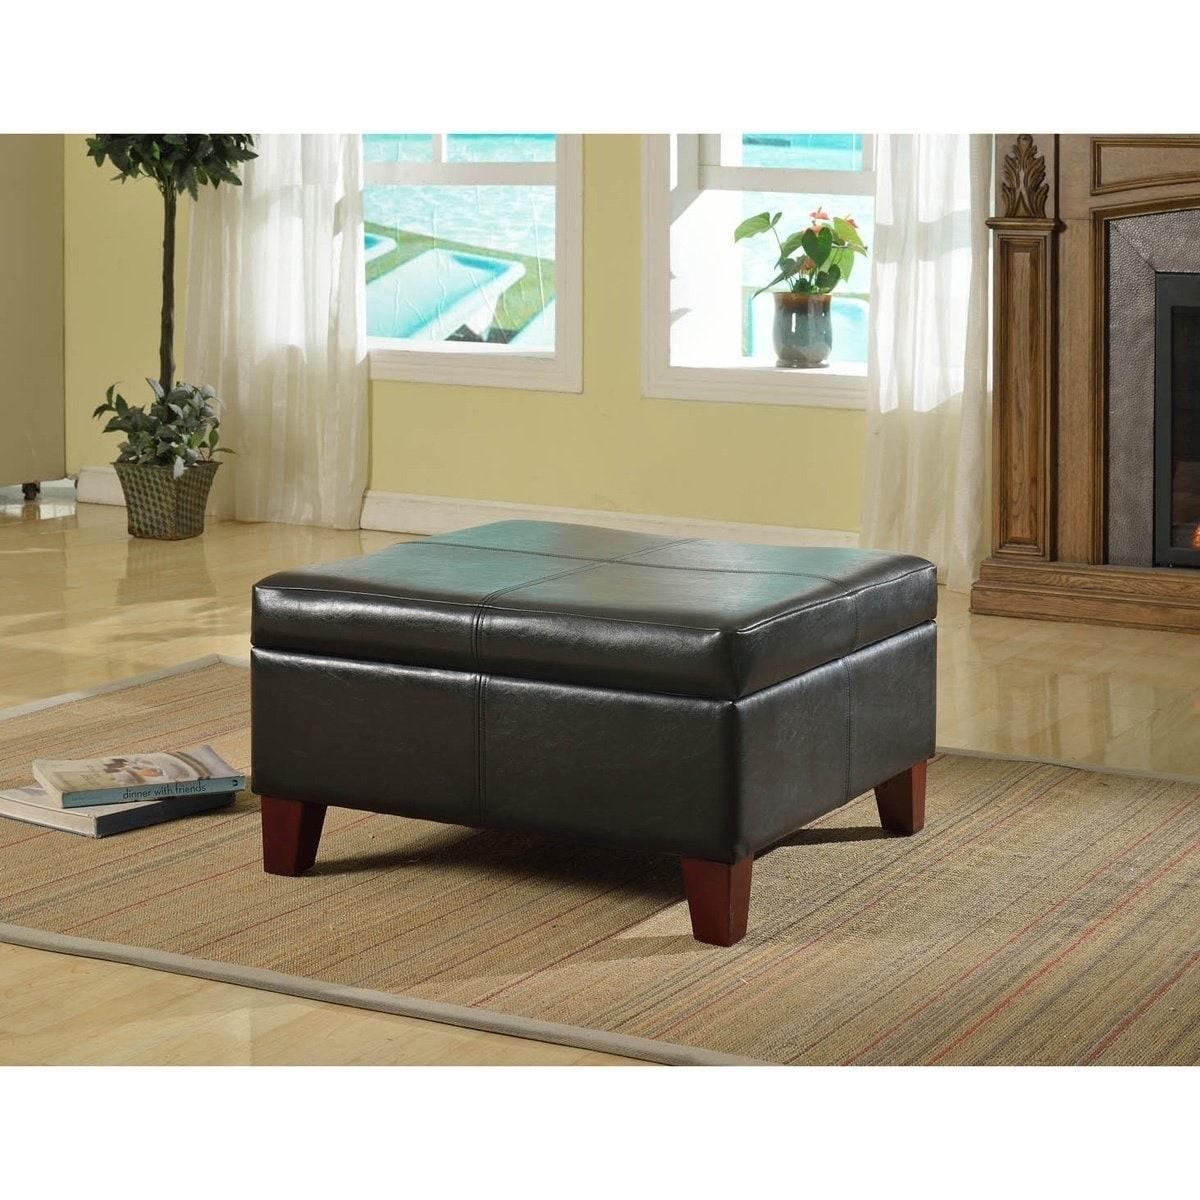 finest selection dc582 4c4c1 Copper Grove Silene Luxury Large Black Faux Leather Storage Ottoman Table